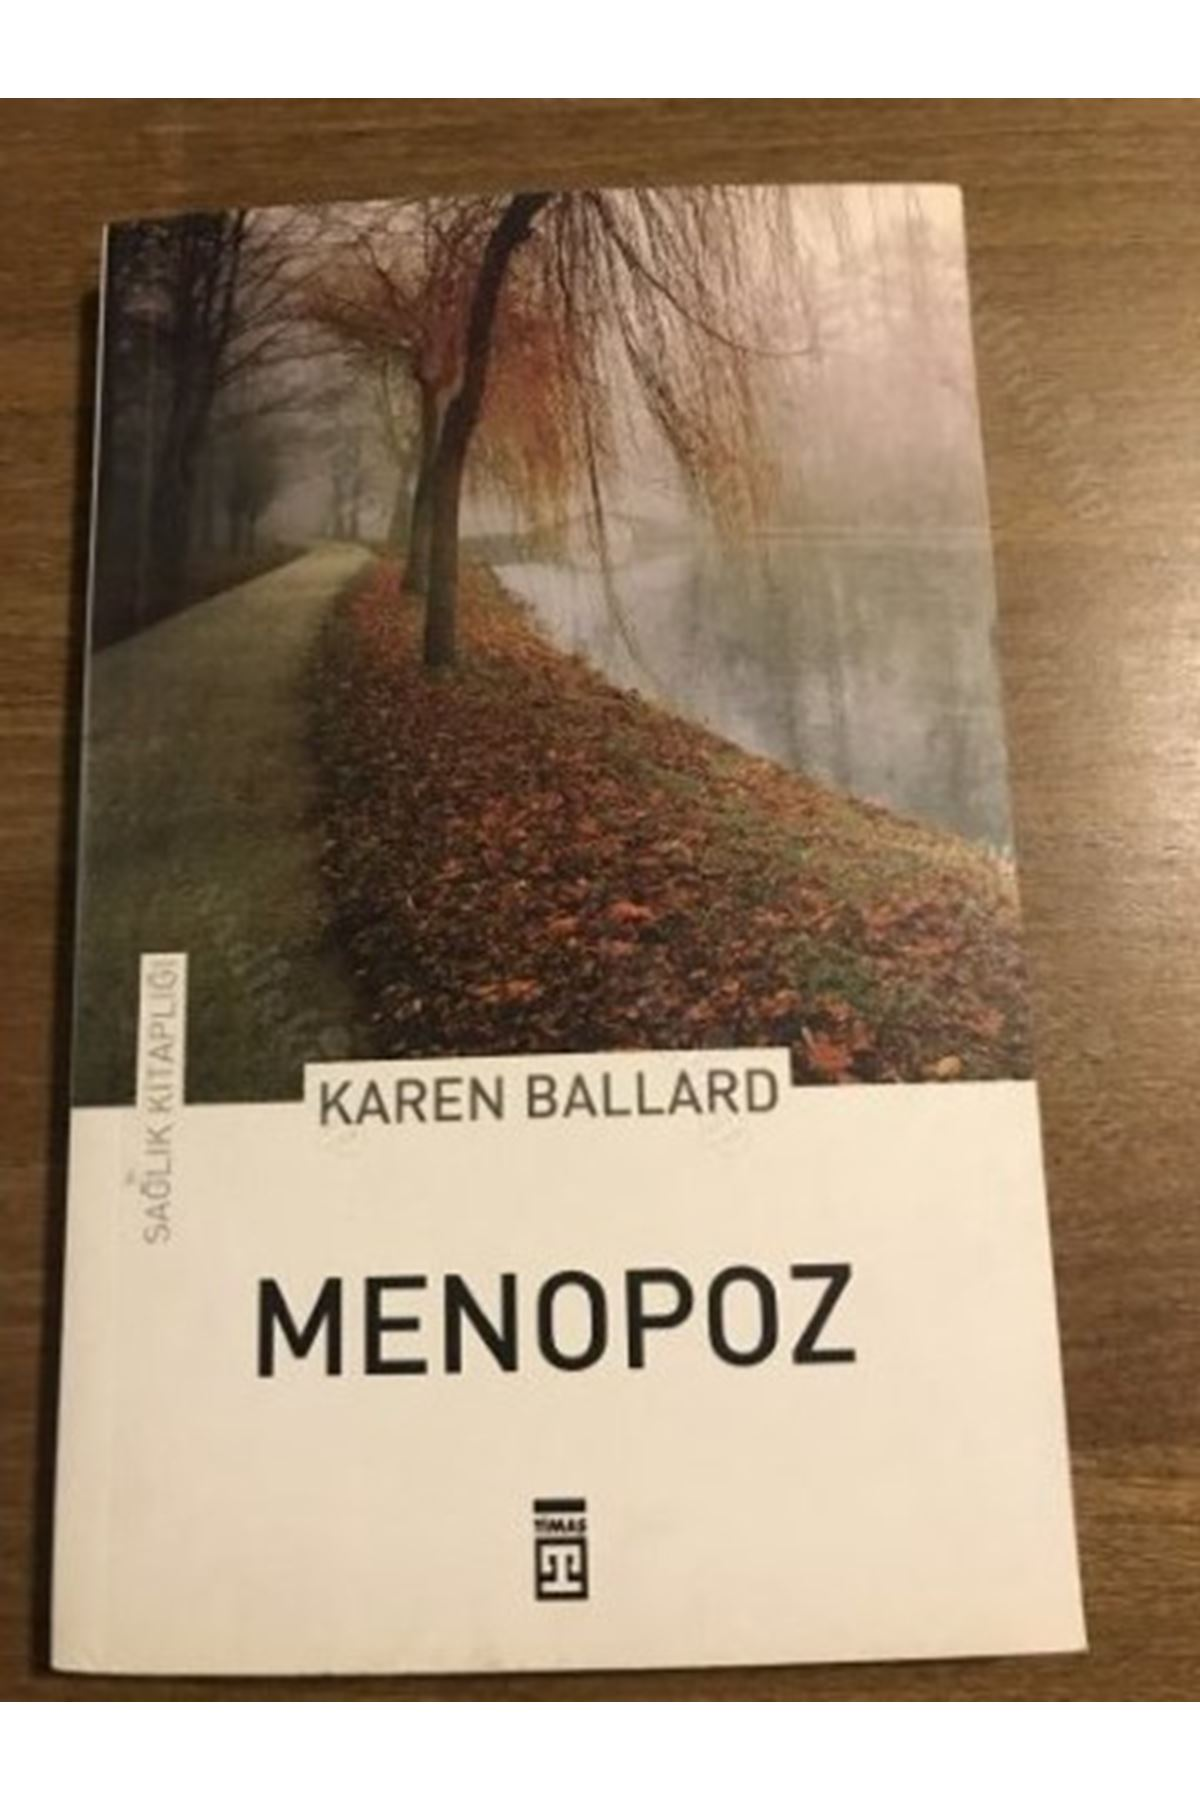 KAREN BALLARD - MENOPOZ